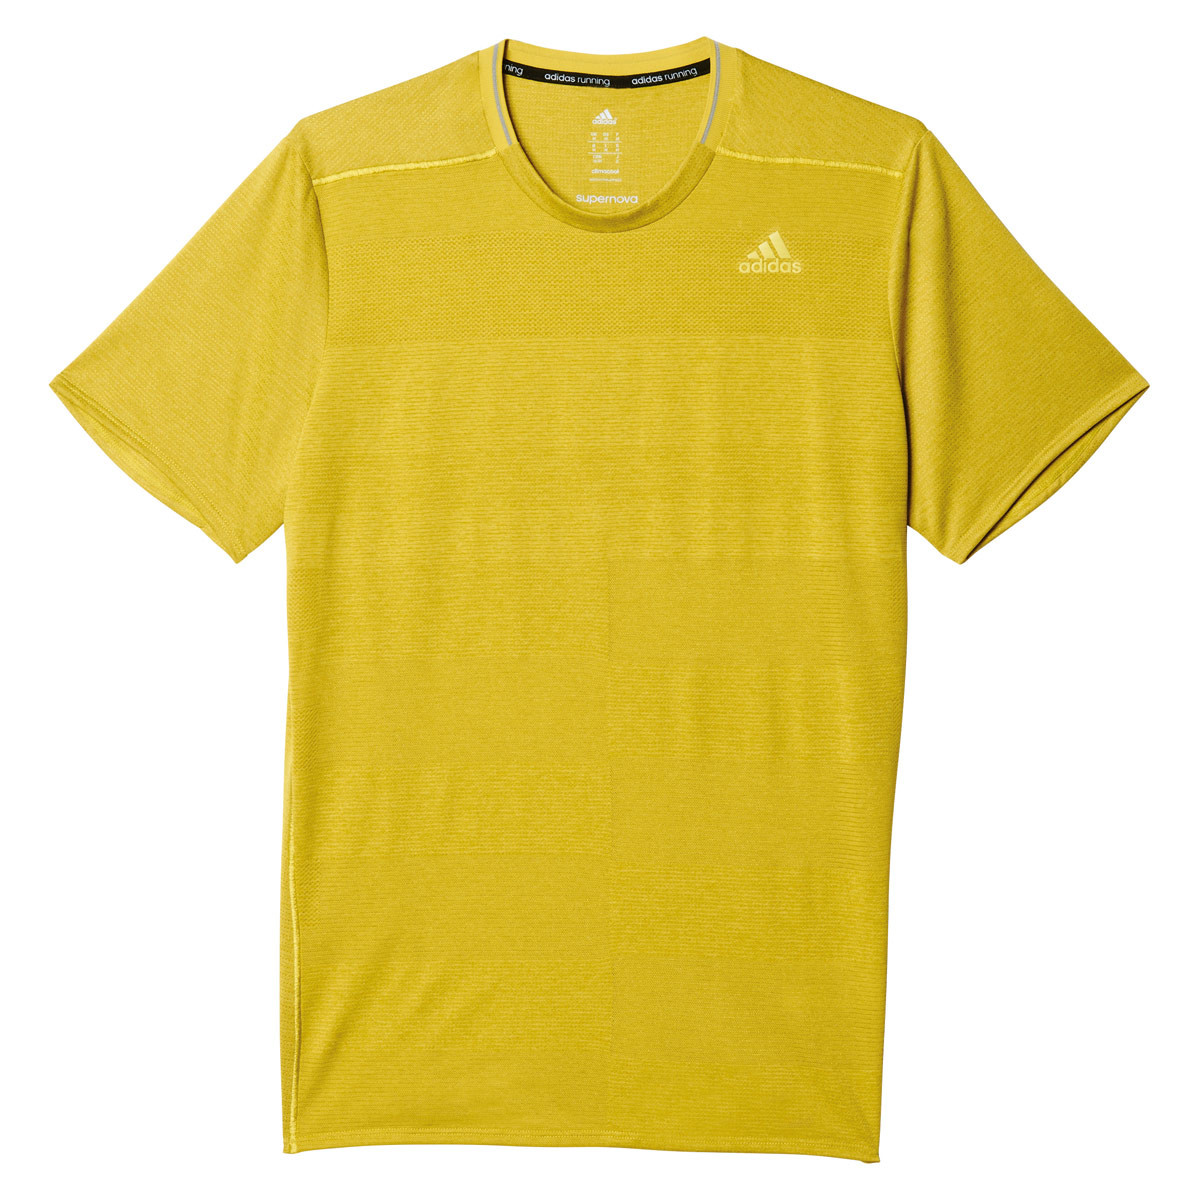 online retailer 010d7 58ded adidas Supernova Short Sleeve - Running tops for Men - Yellow   21RUN